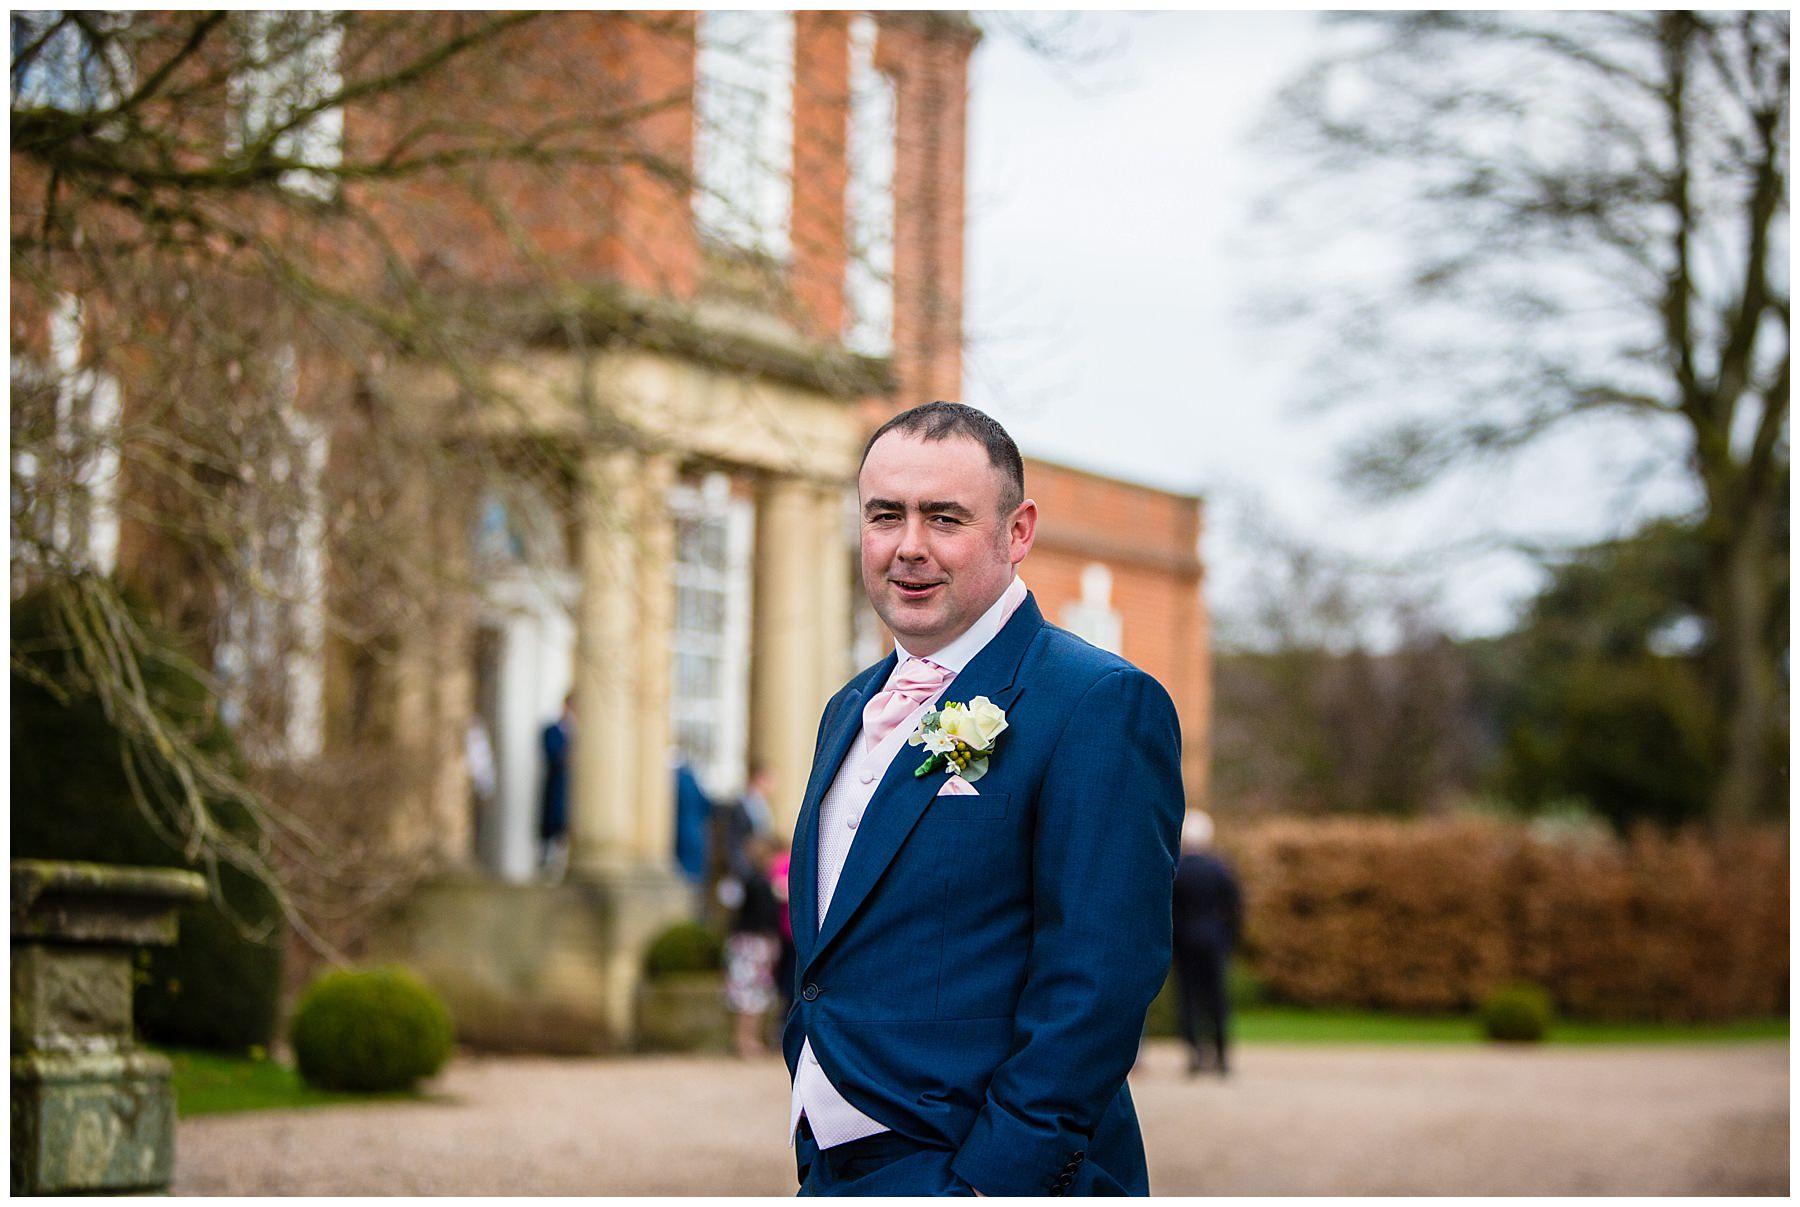 groom portrait in navy suit infront of isooyd park building - iscoyd wedding photographer